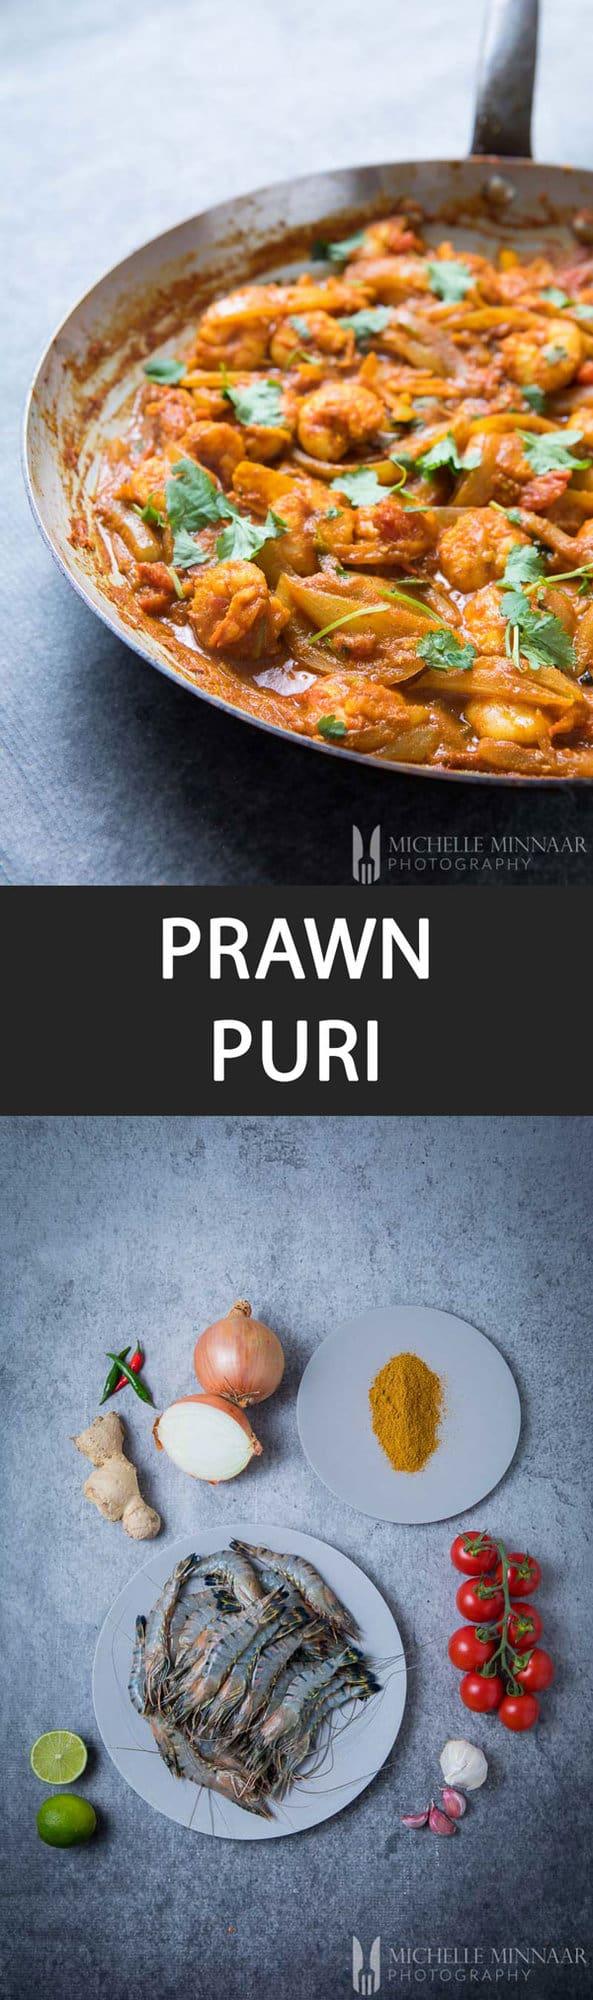 Prawn Puri